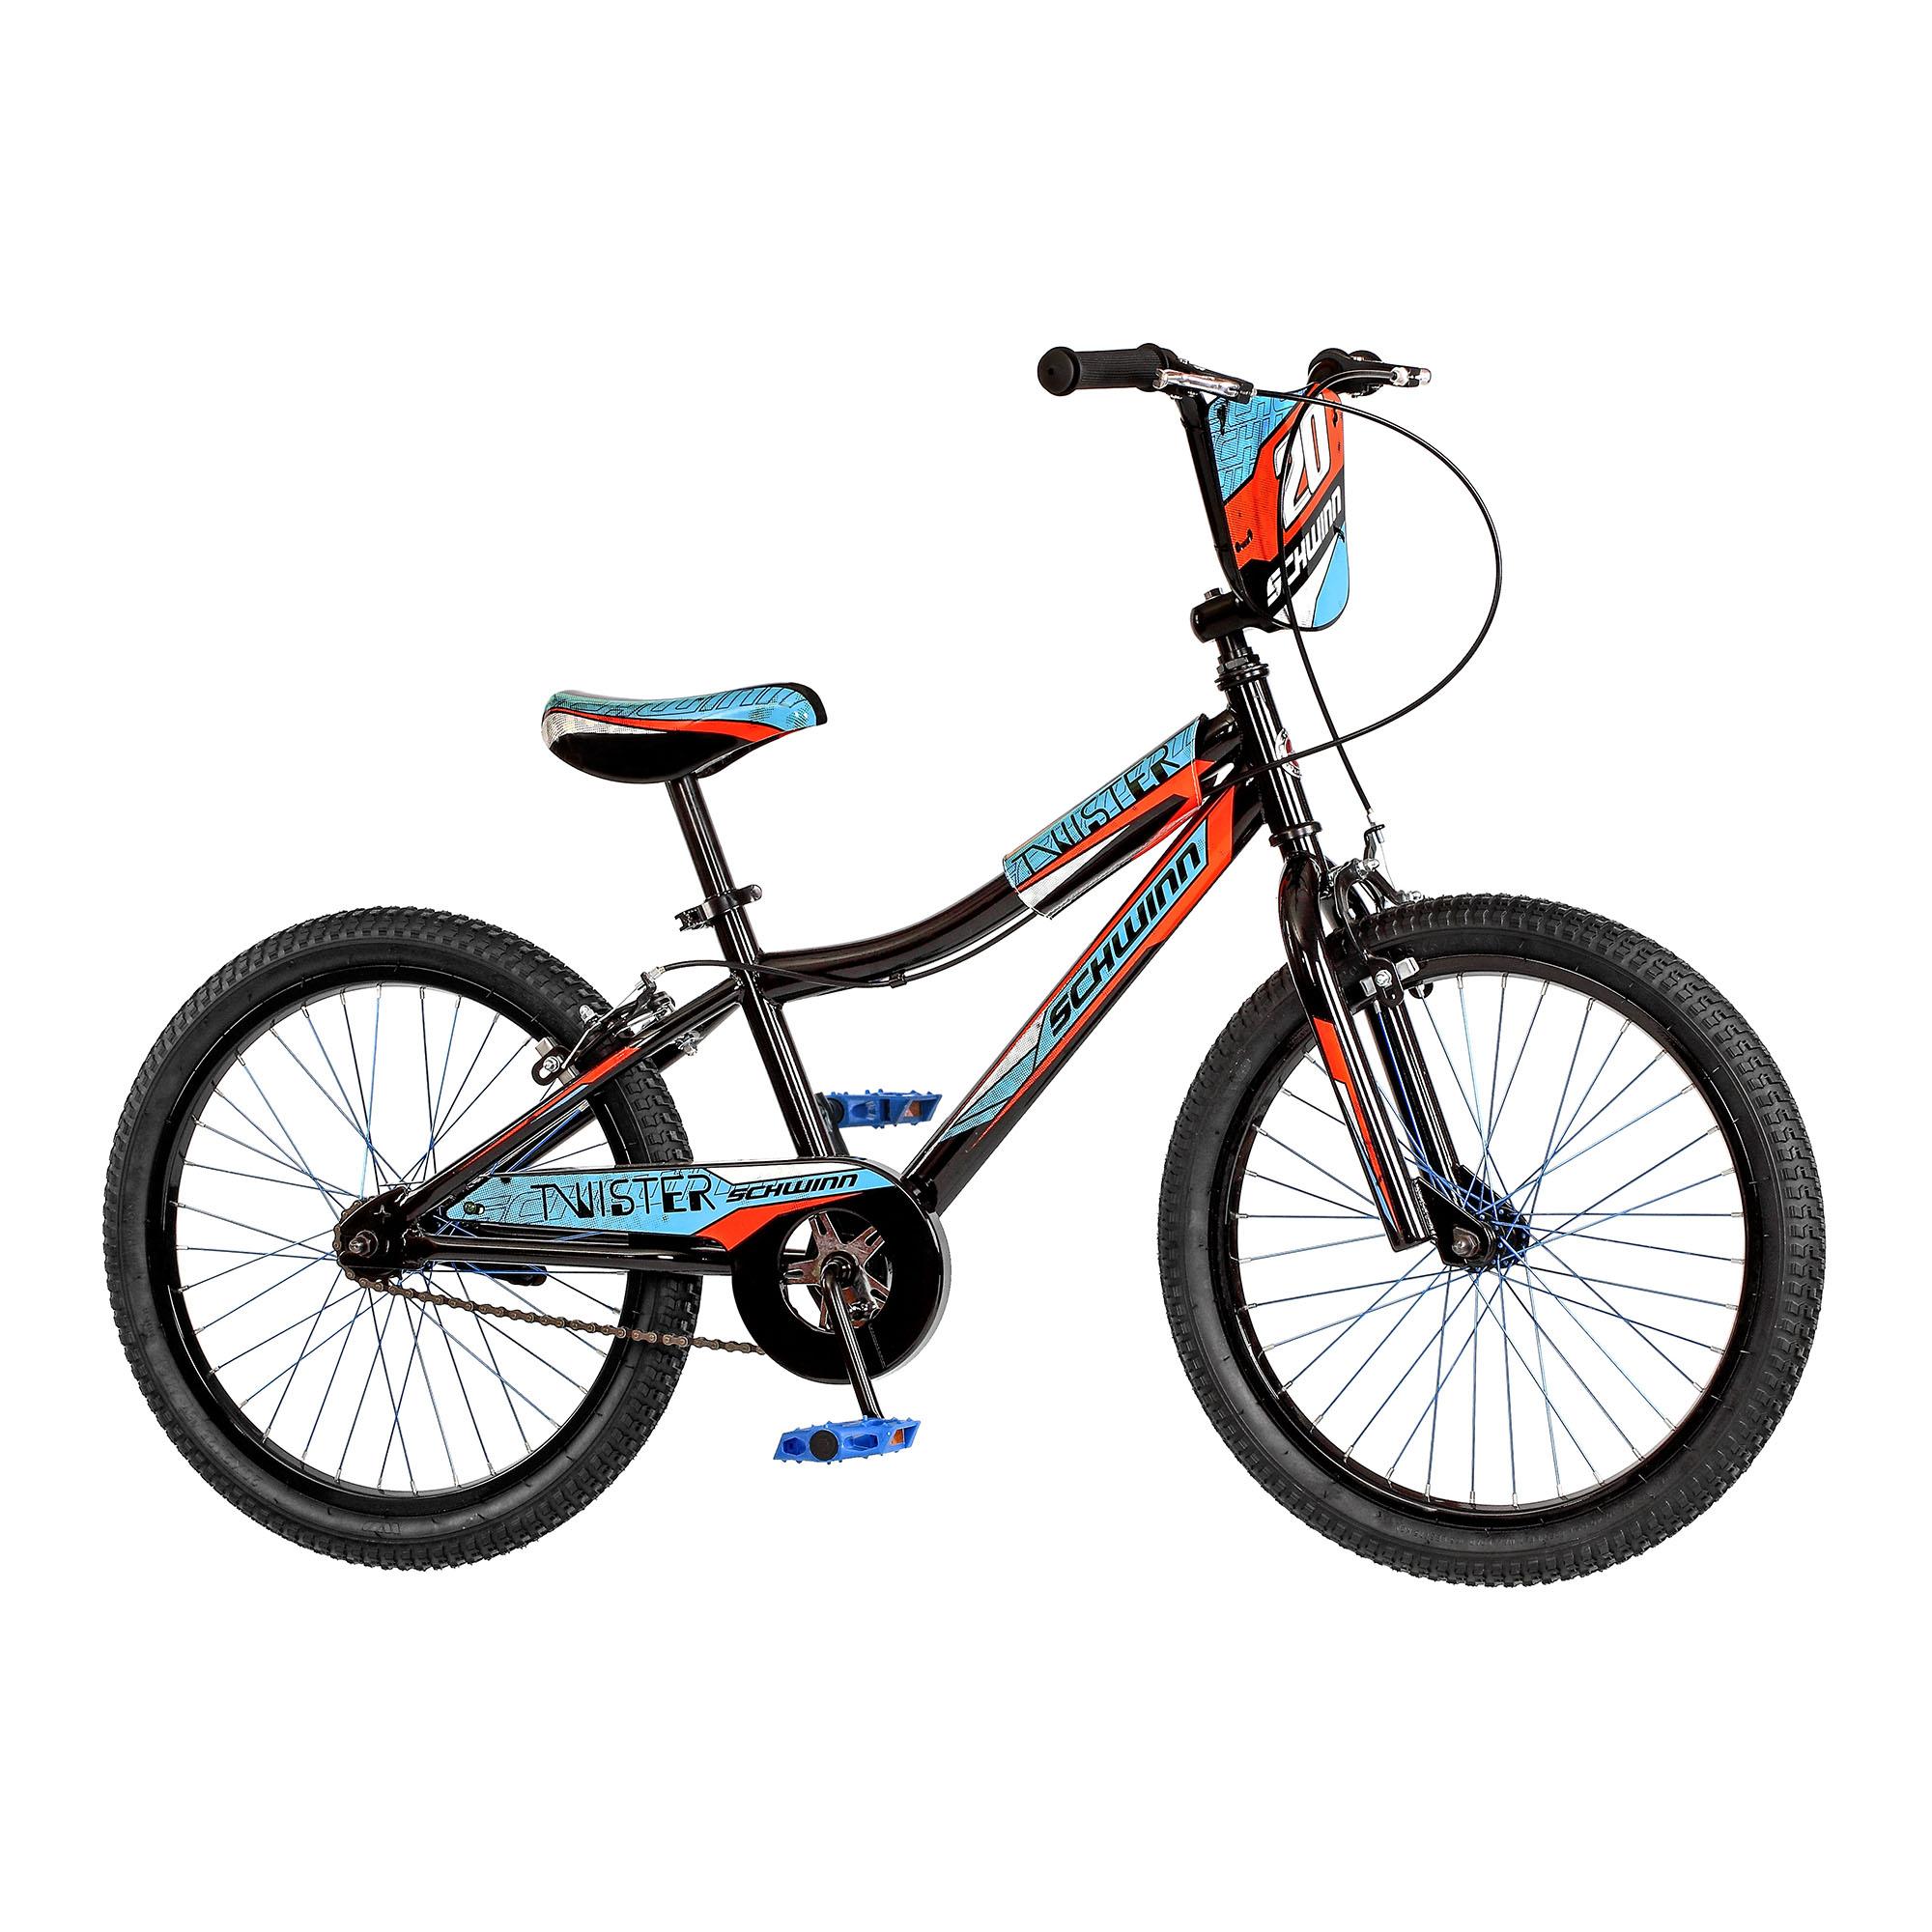 "Schwinn SmartStart Twister 20"" Steel Frame Hand Brake Kids Sidewalk Bicycle"